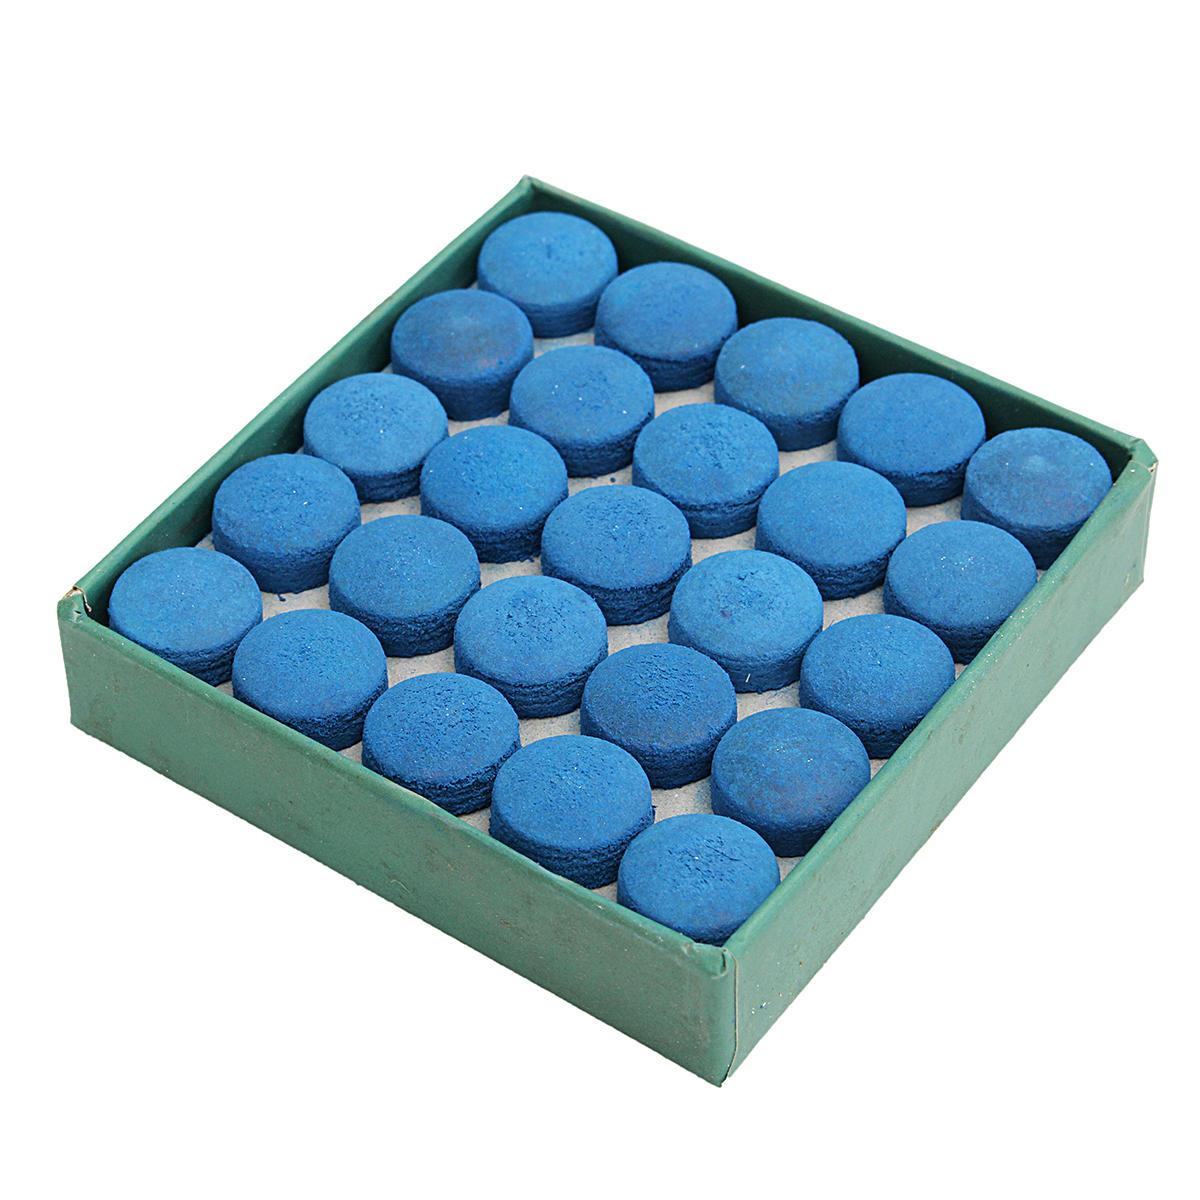 50Pcs Pegamento Piscina Billar cuero azul Cue Tips Caja Juego Sport 9mm 10mm 13mm - 7